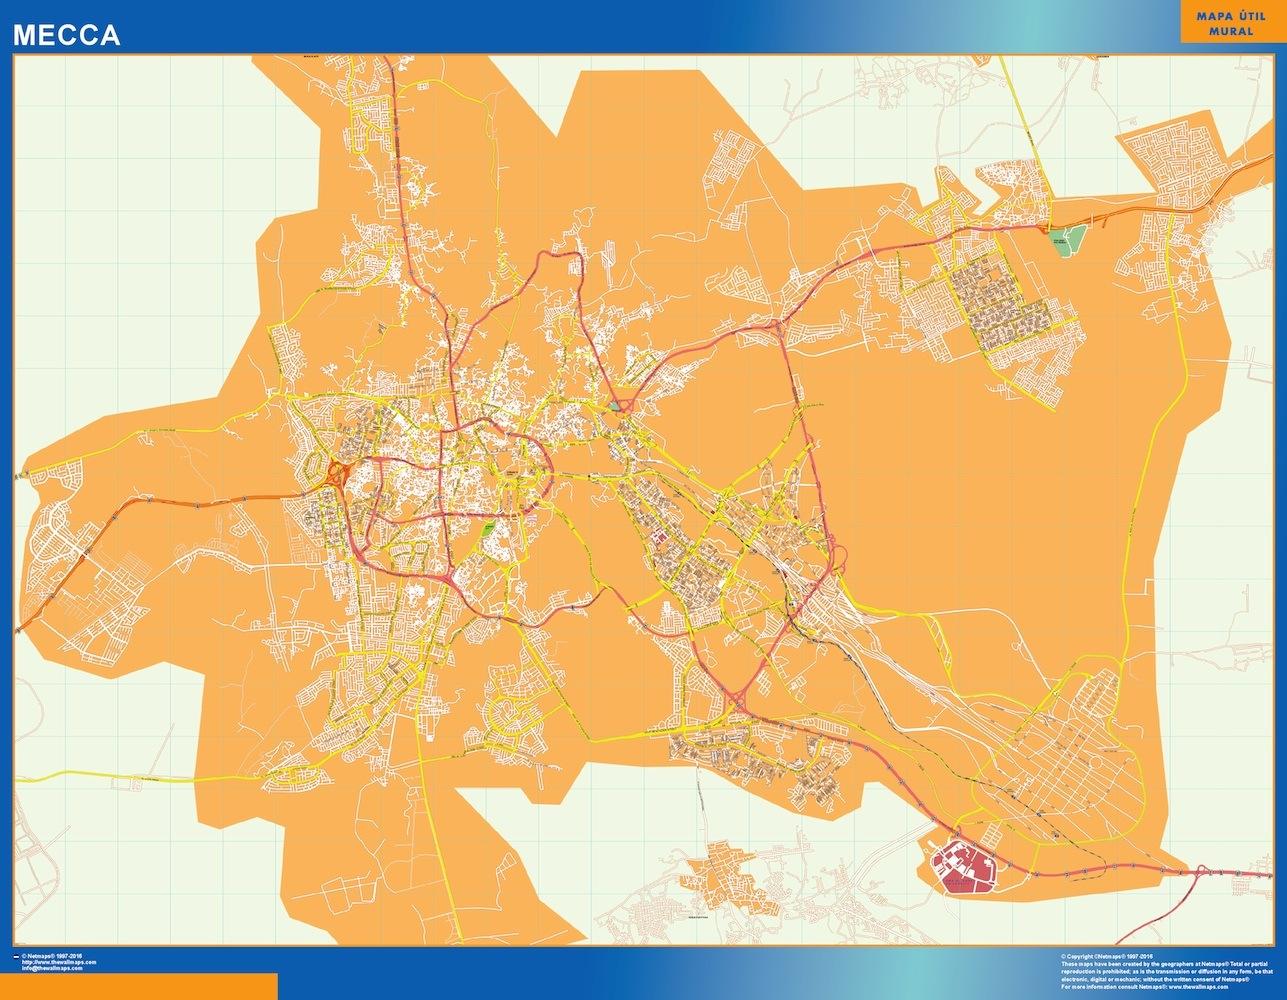 Saudi Arabia City Maps The Wall Maps Wall Maps of the World